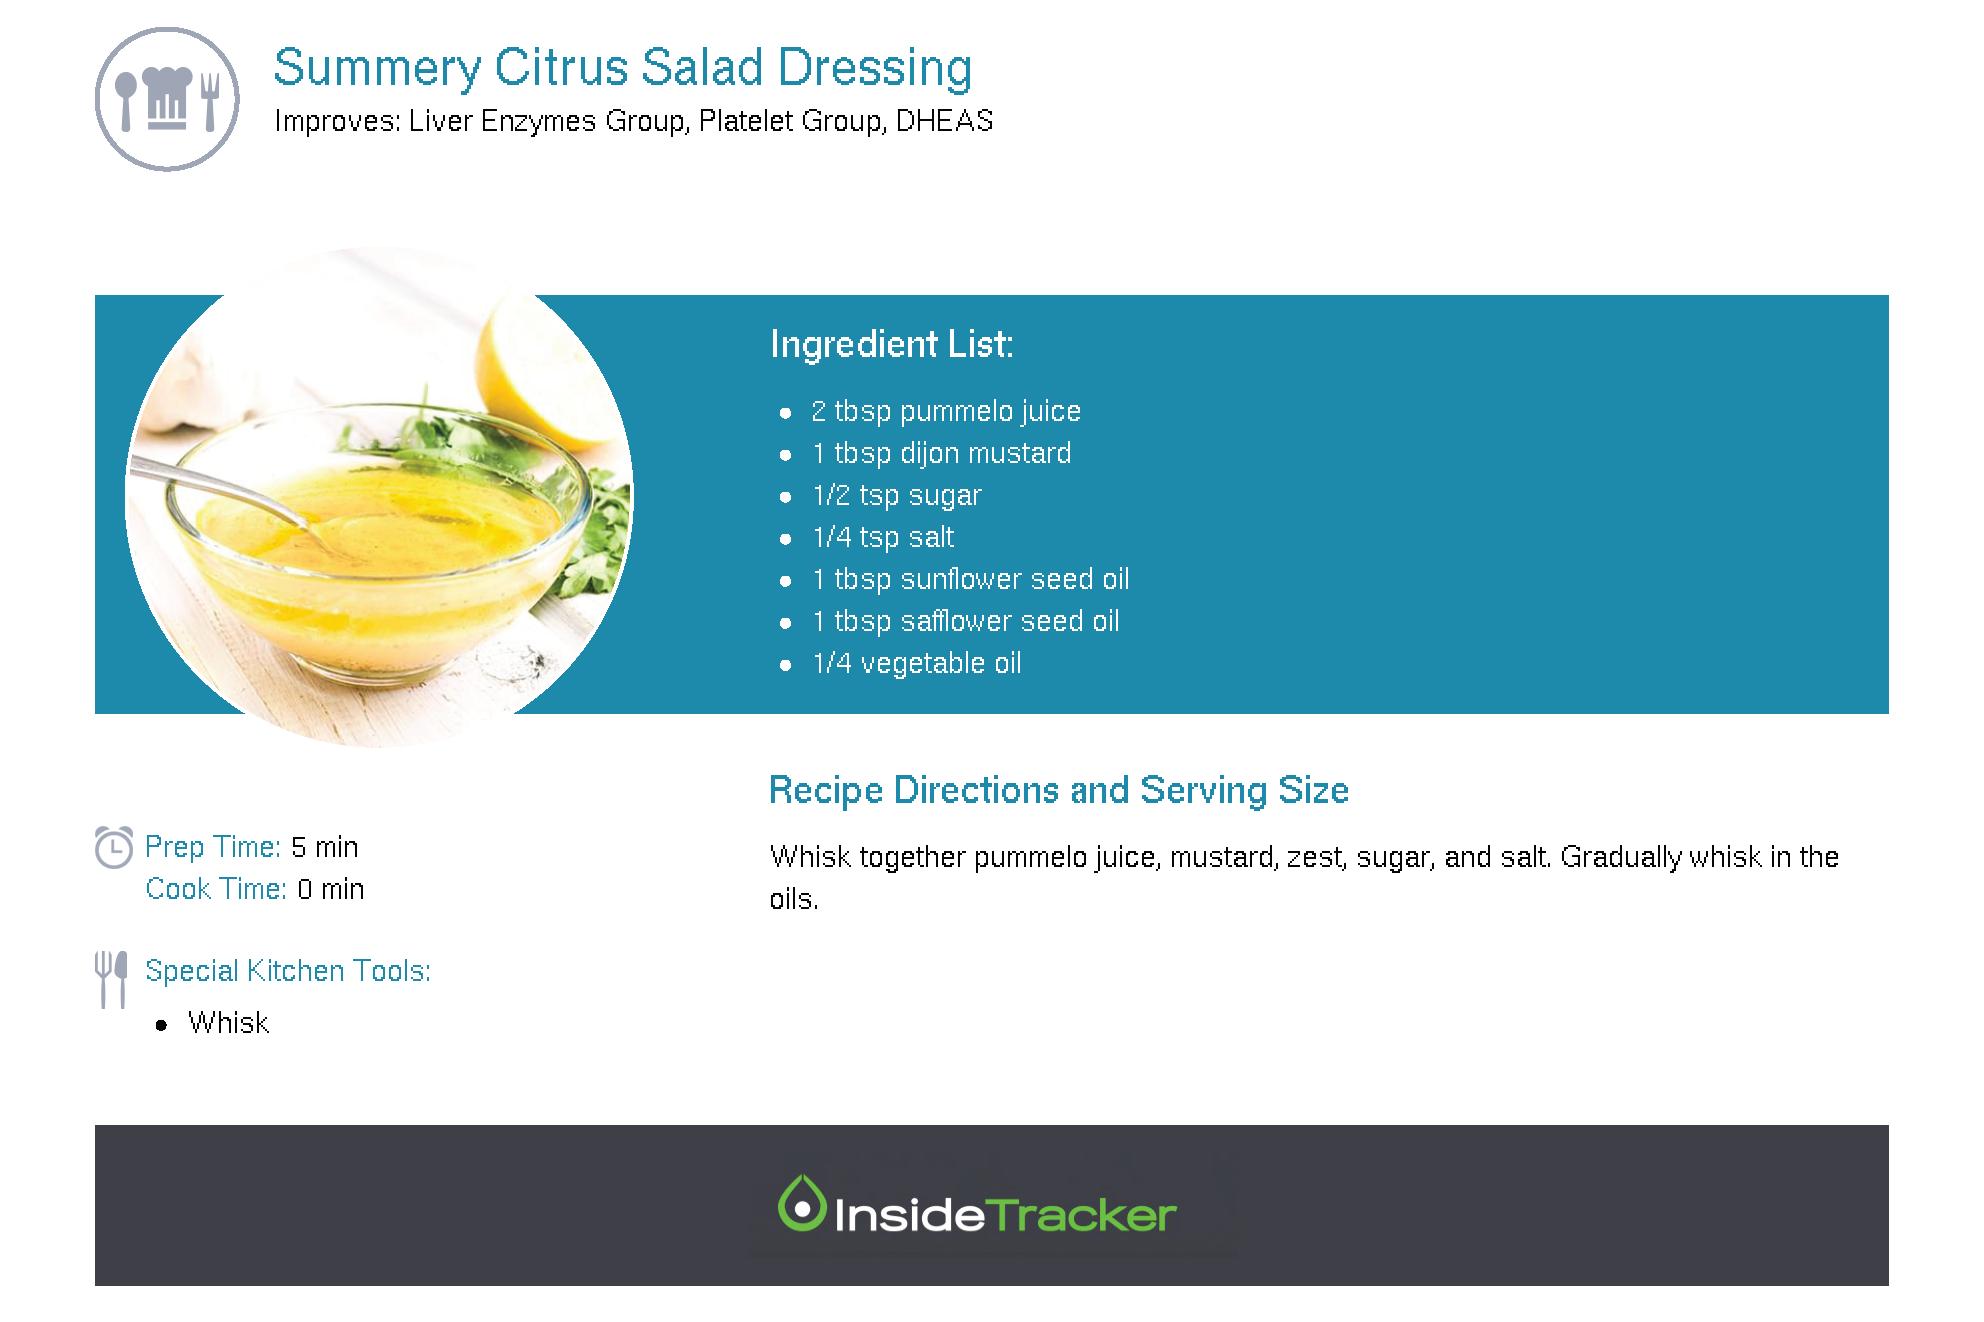 Summery Citrus Salad Dressing